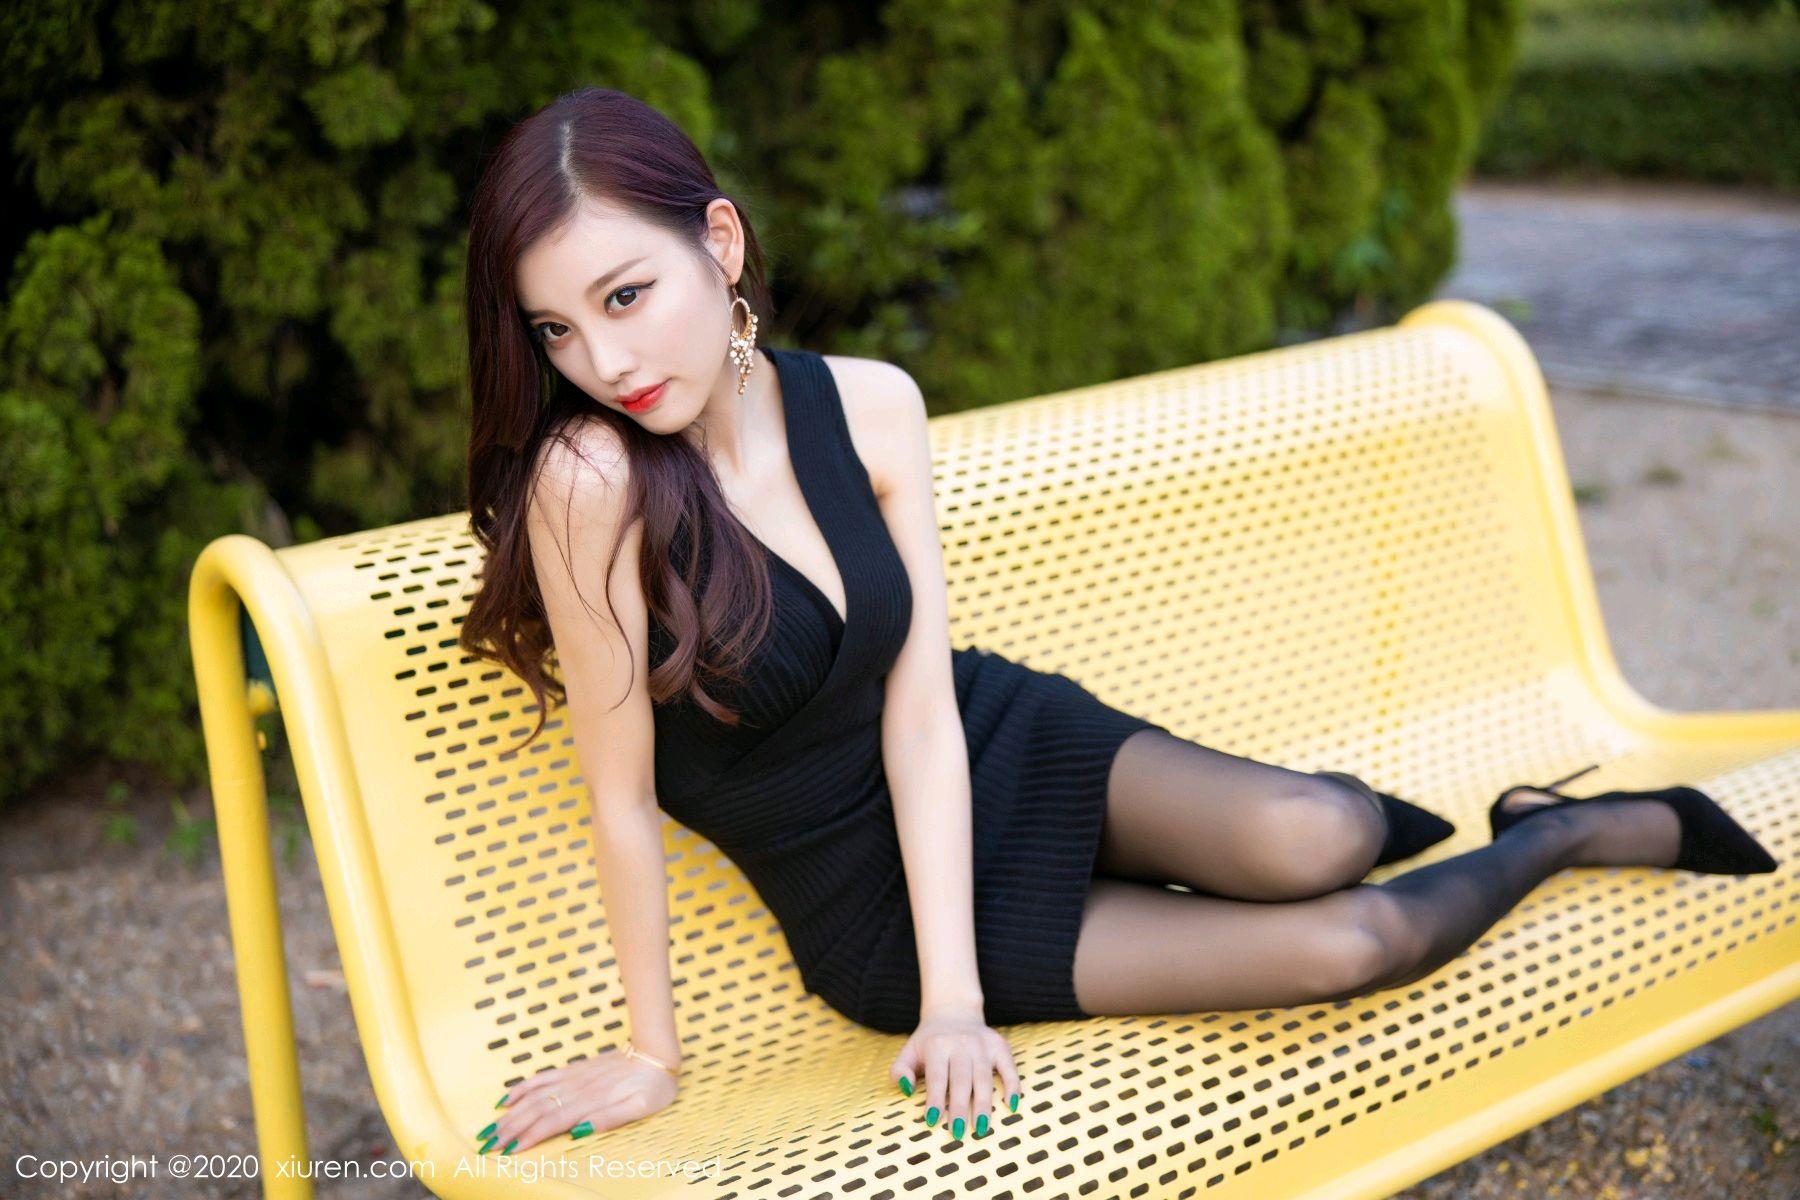 [XiuRen] Vol.2648 Yang Chen Chen 60P, Black Silk, Outdoor, Xiuren, Yang Chen Chen